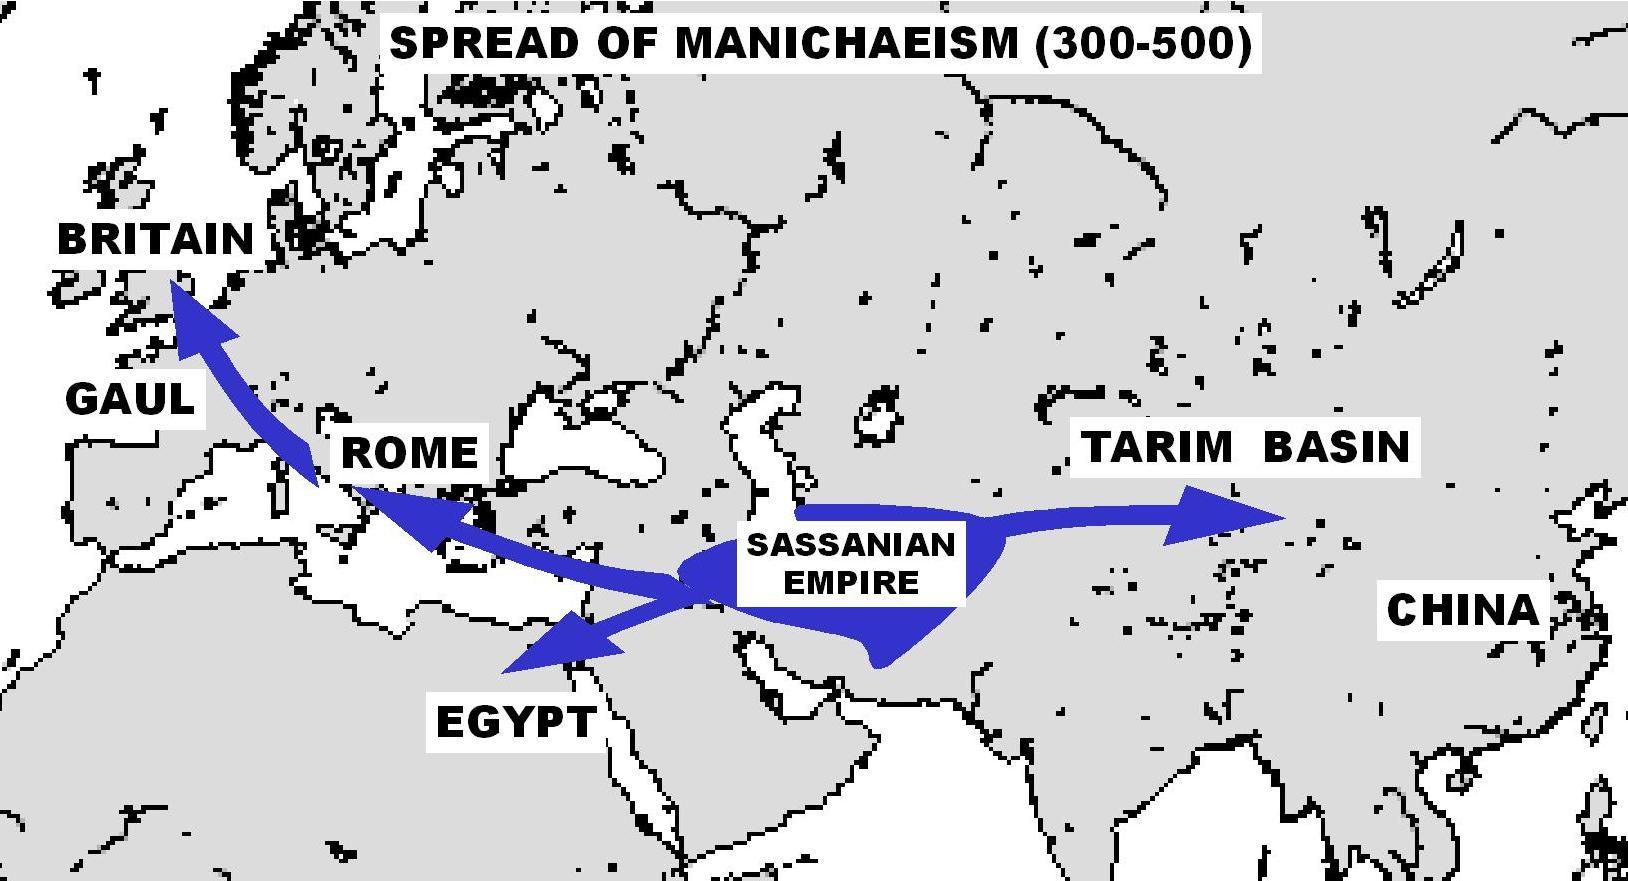 MANICHAEISM: MANICHAEISM IN CENTRAL ASIA AND CHINA